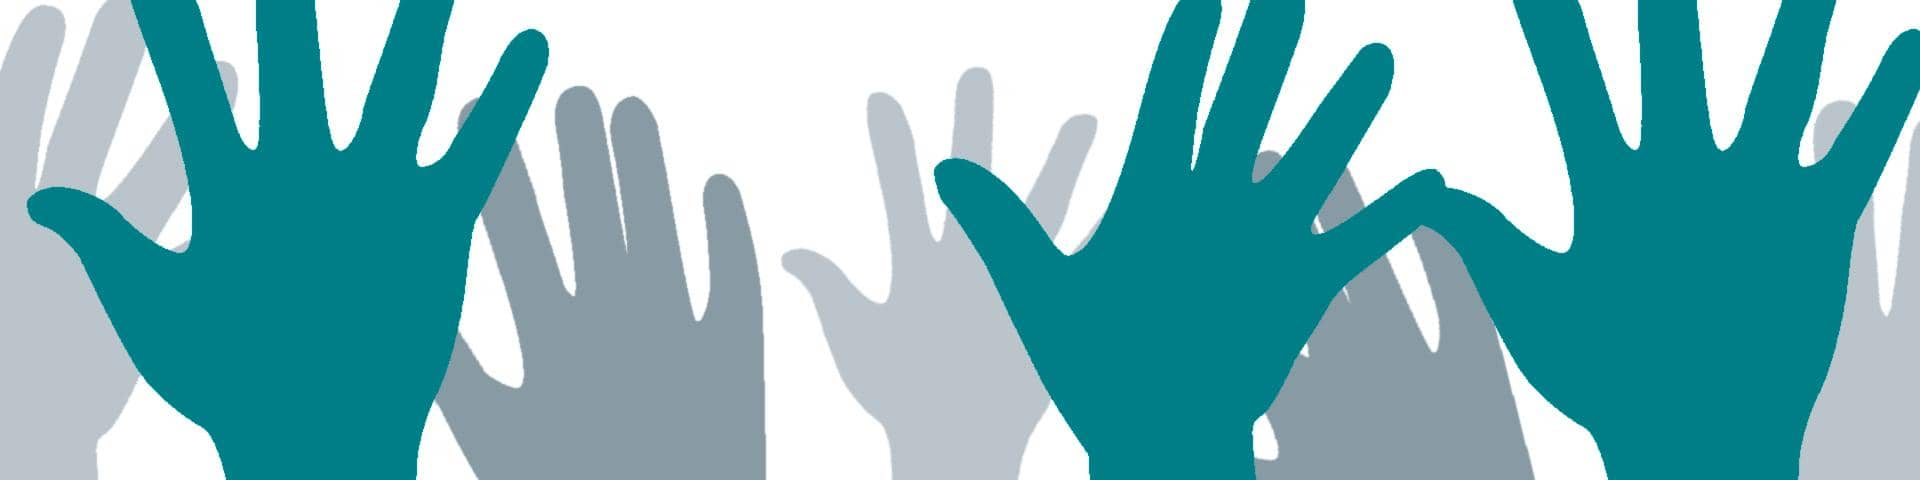 Hands blue grey